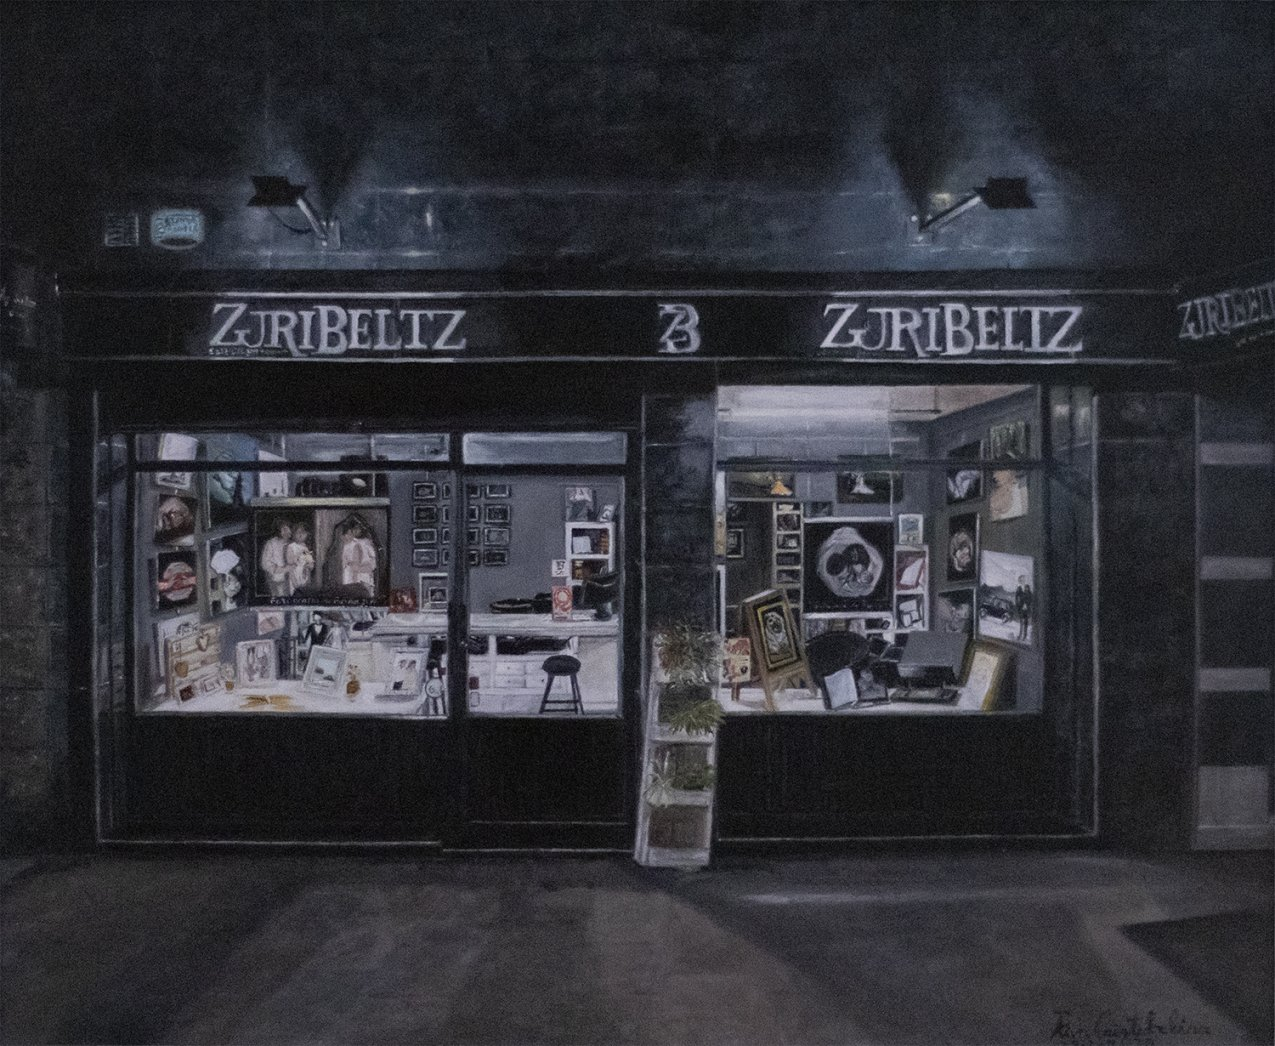 ZURIBELTZ (2020) - Sara Caballero Paniagua - Riva Cristobalina